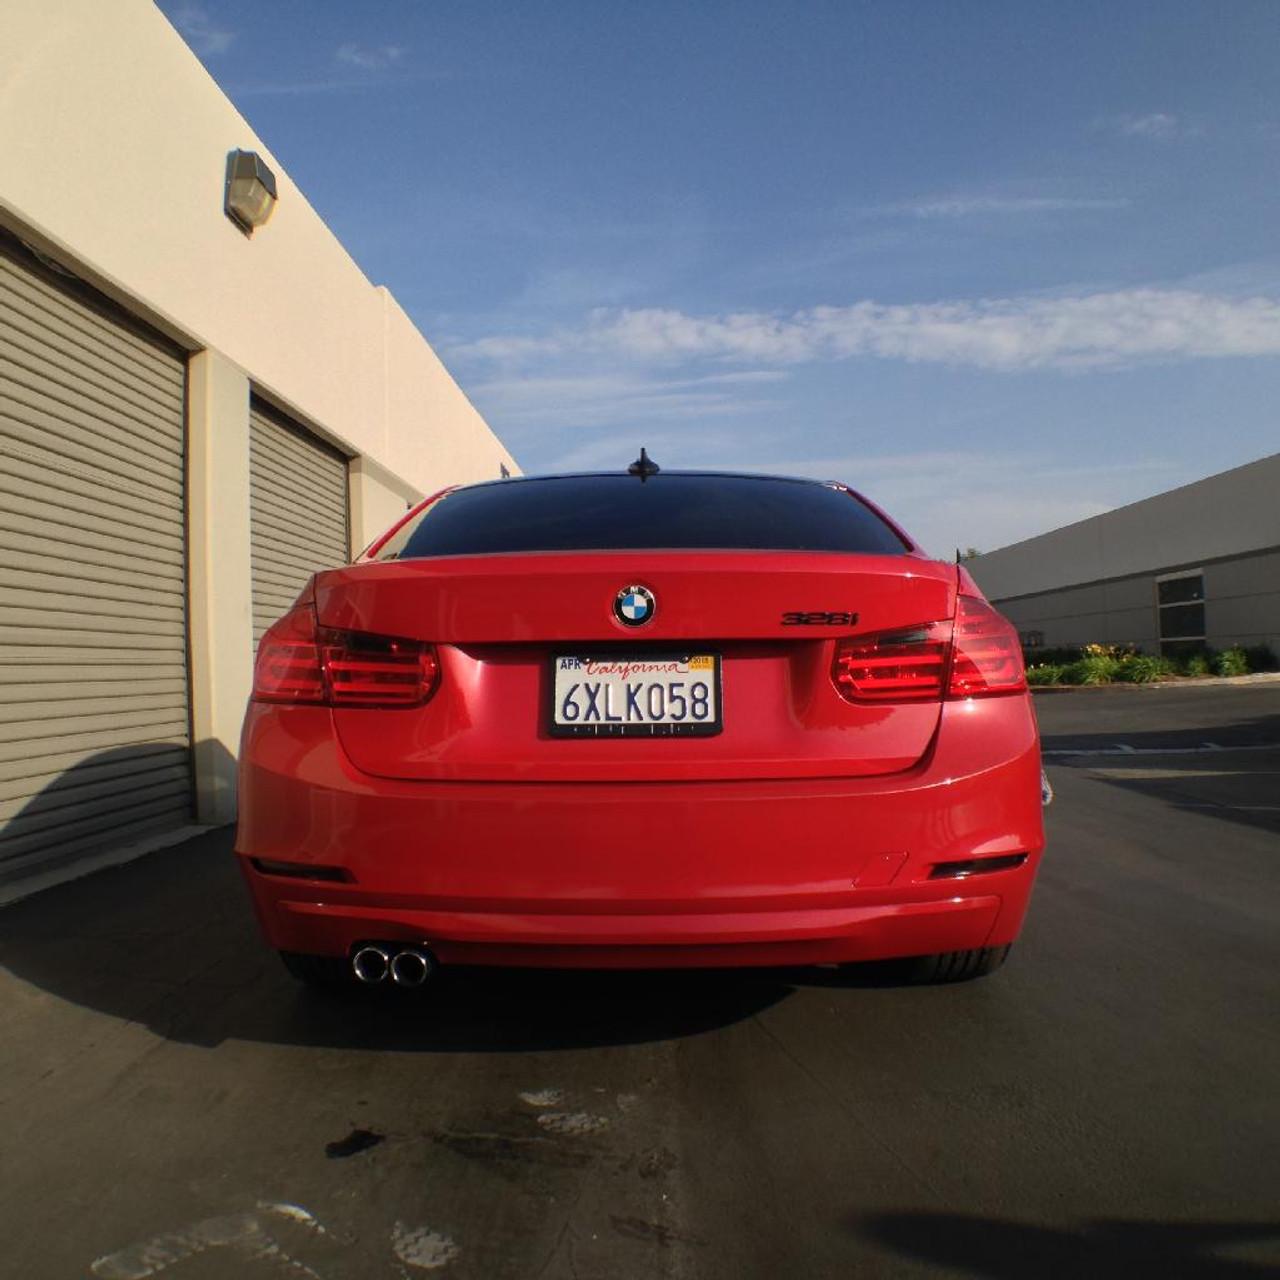 Rear Bumper Reflector Overlays Smoke Tint 2012 2014 Bmw F30 Premium Auto Styling